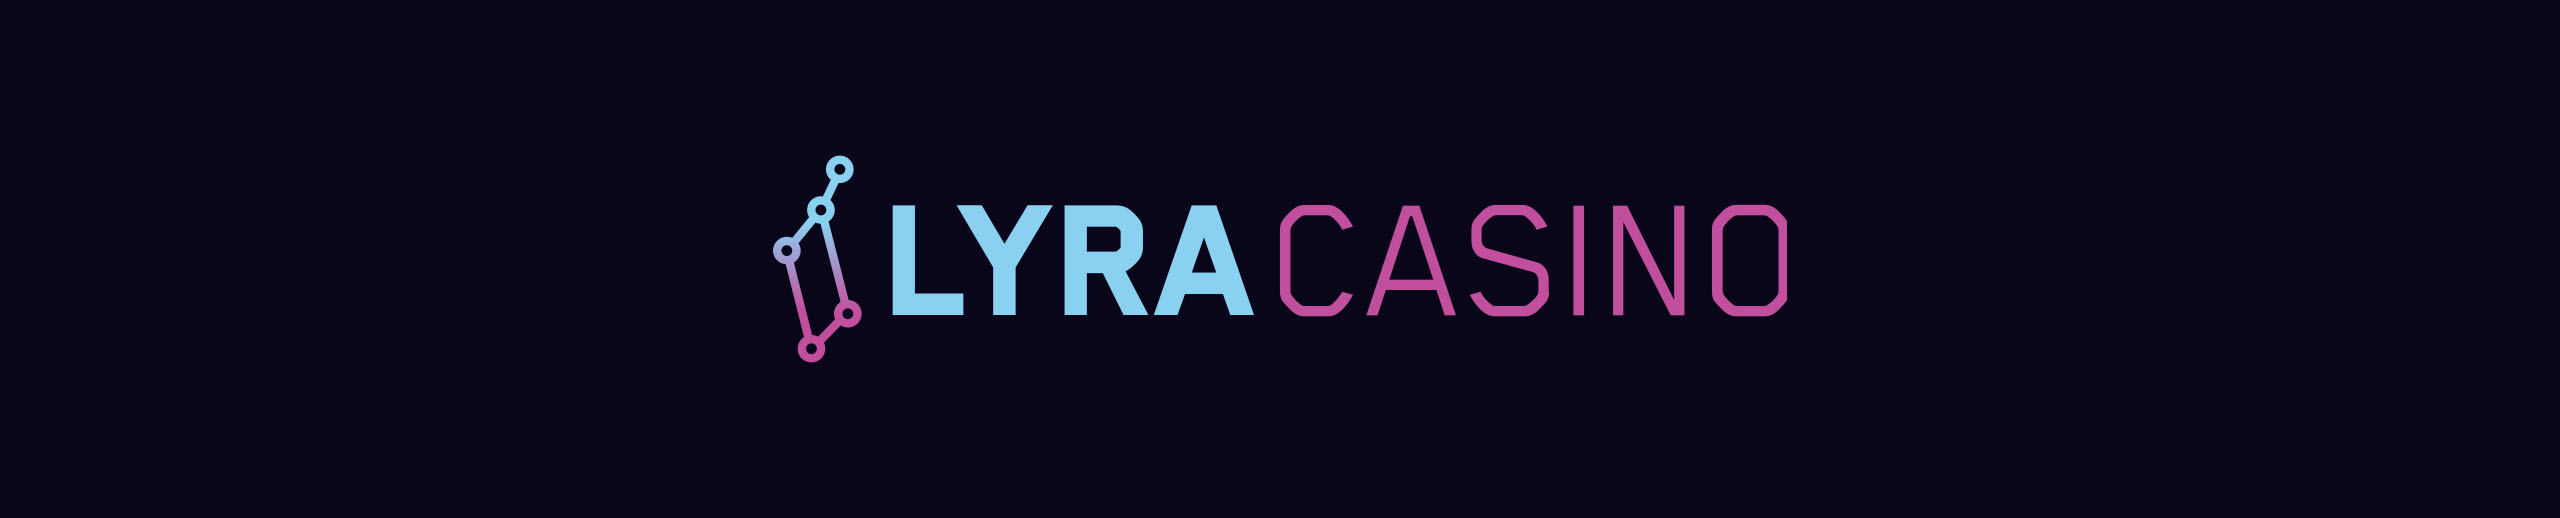 Lyra Casino